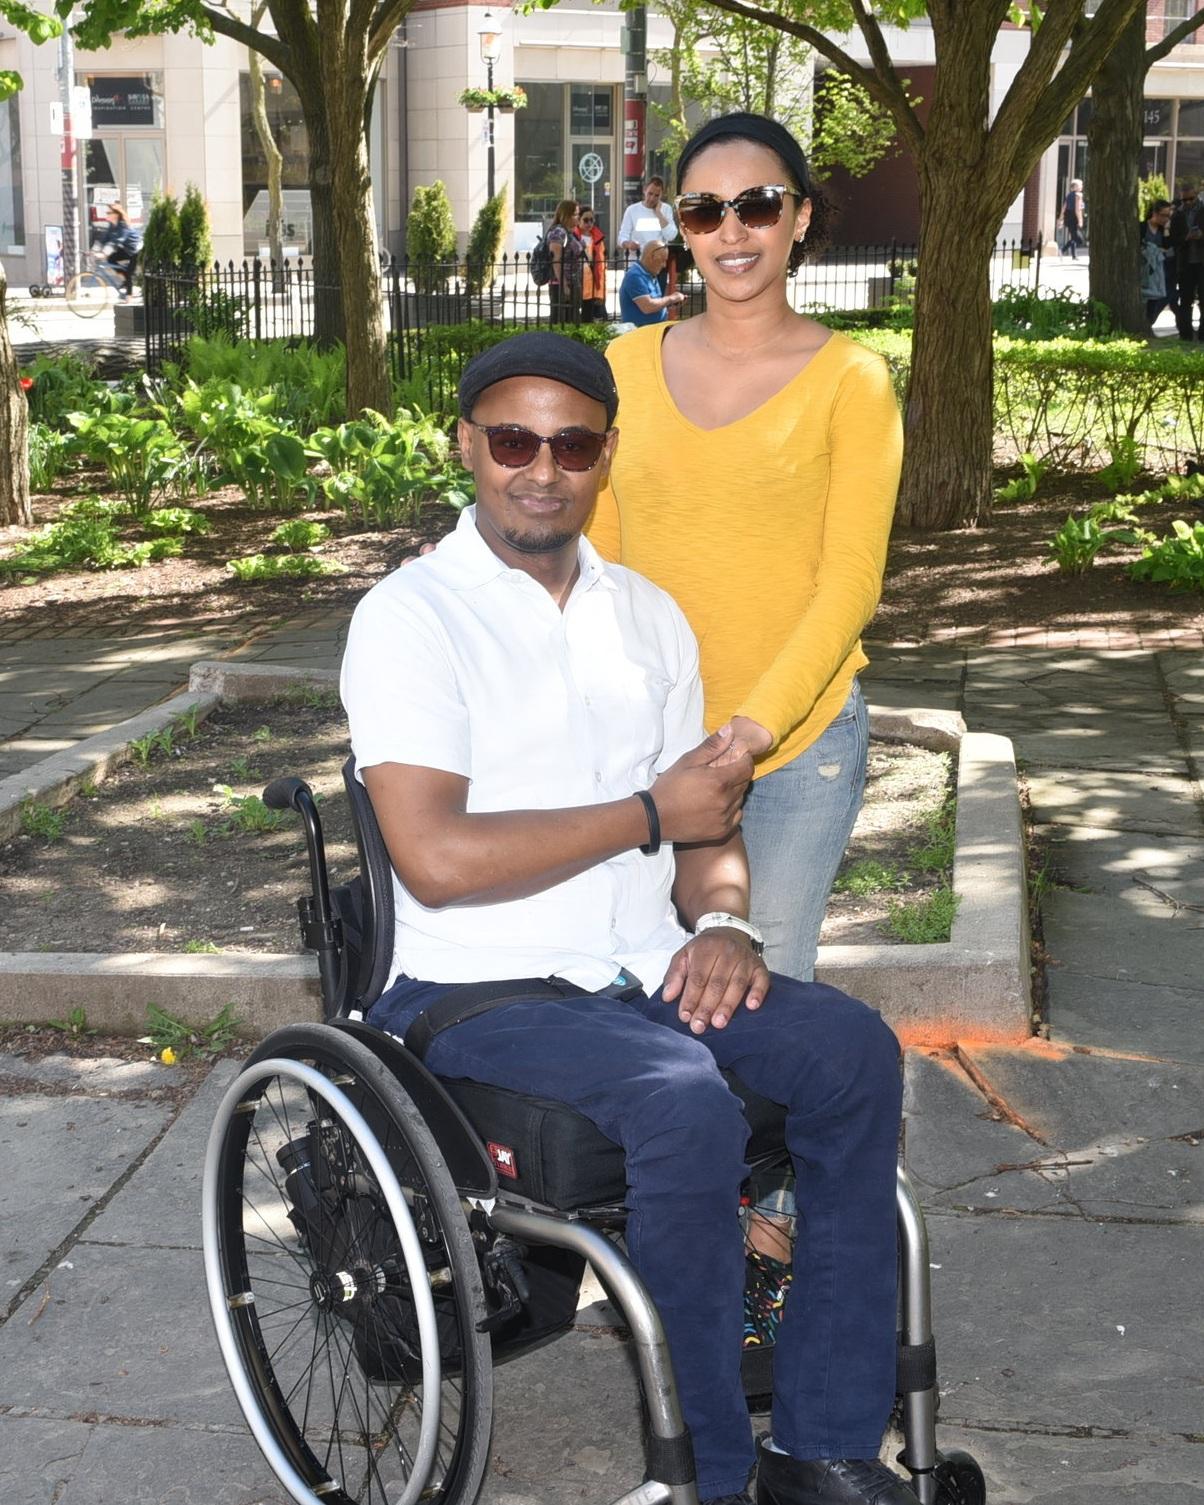 Amanuel Zermariam and his wife Misgana Teklesenbet